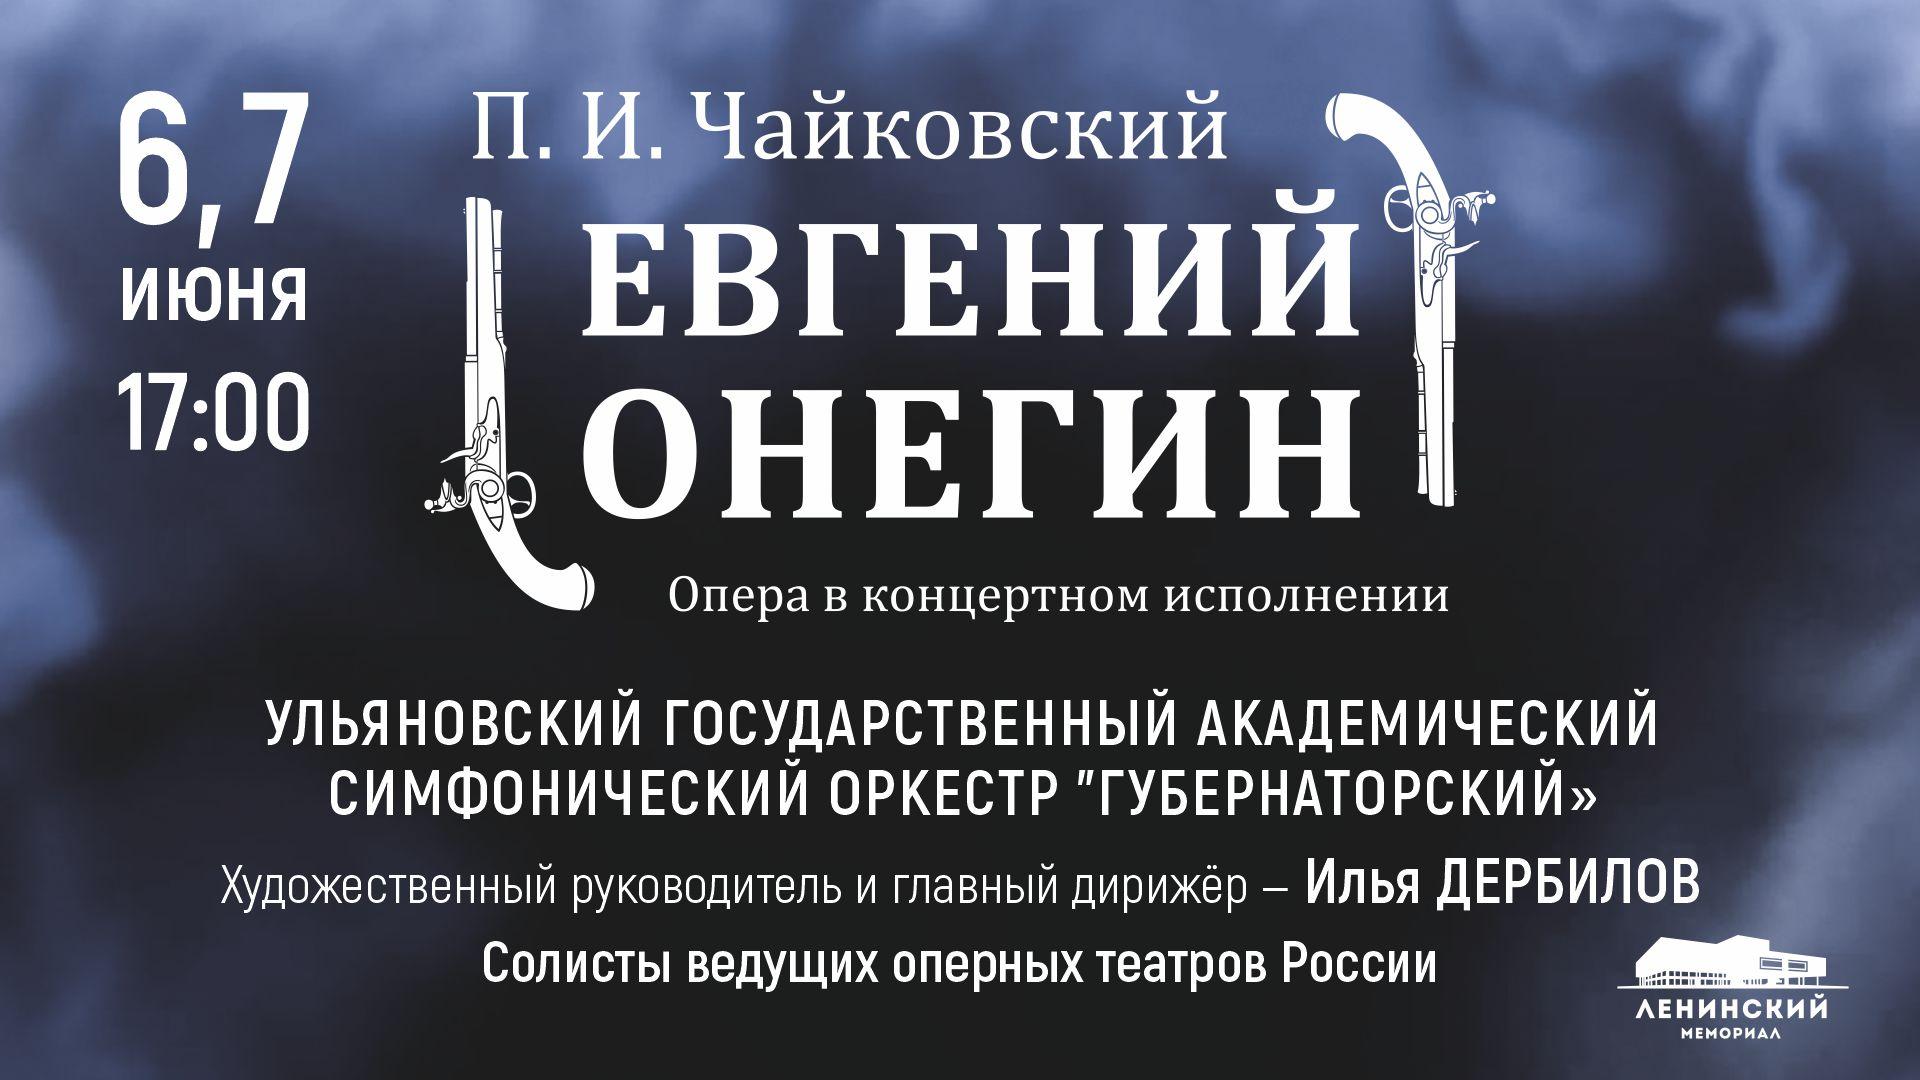 "Онлайн-концерт ""П. И. Чайковский. Евгений Онегин"""